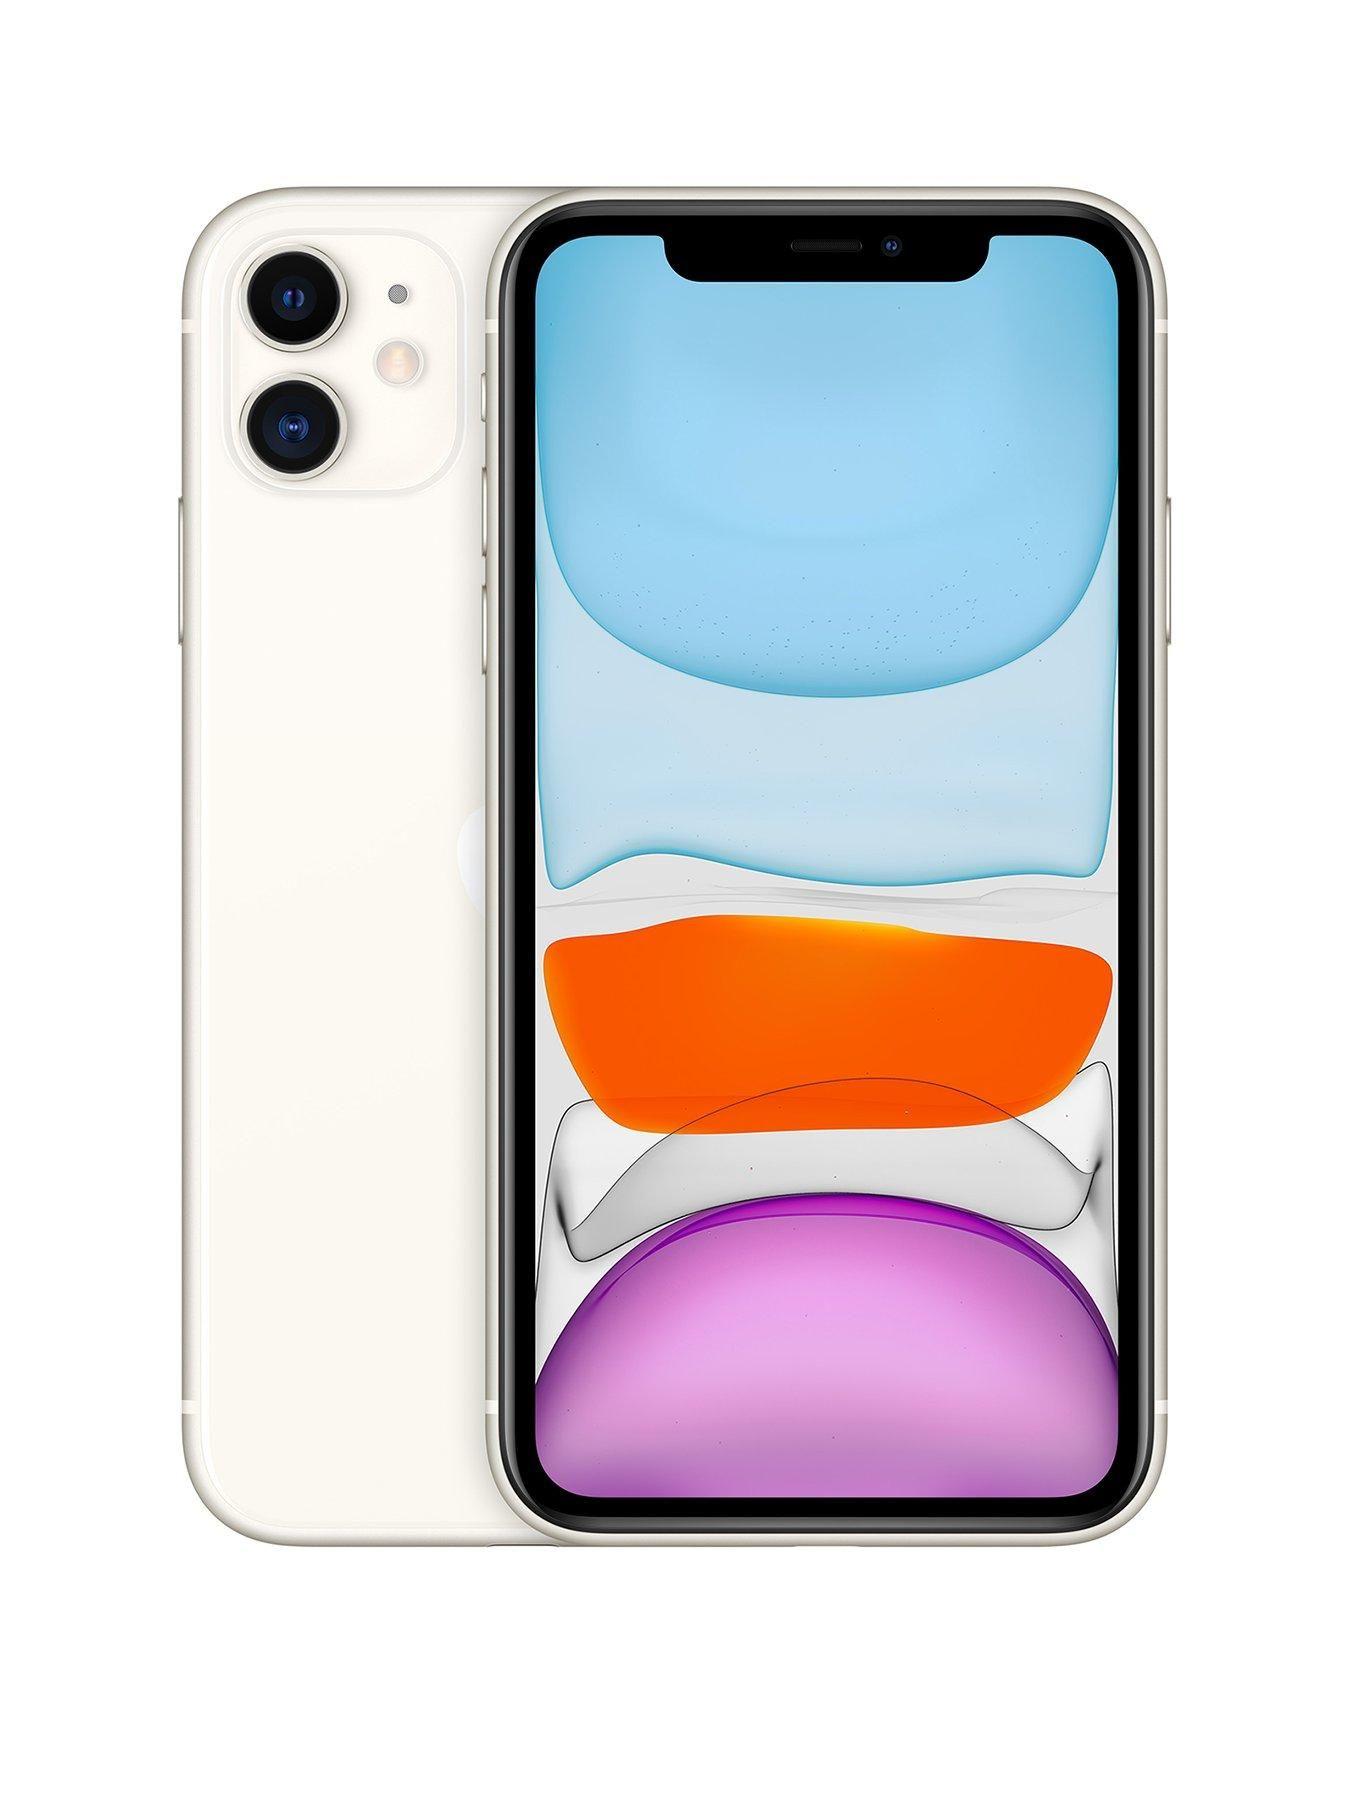 Apple Iphone 11 256gb White In 2020 Iphone 11 Apple Iphone